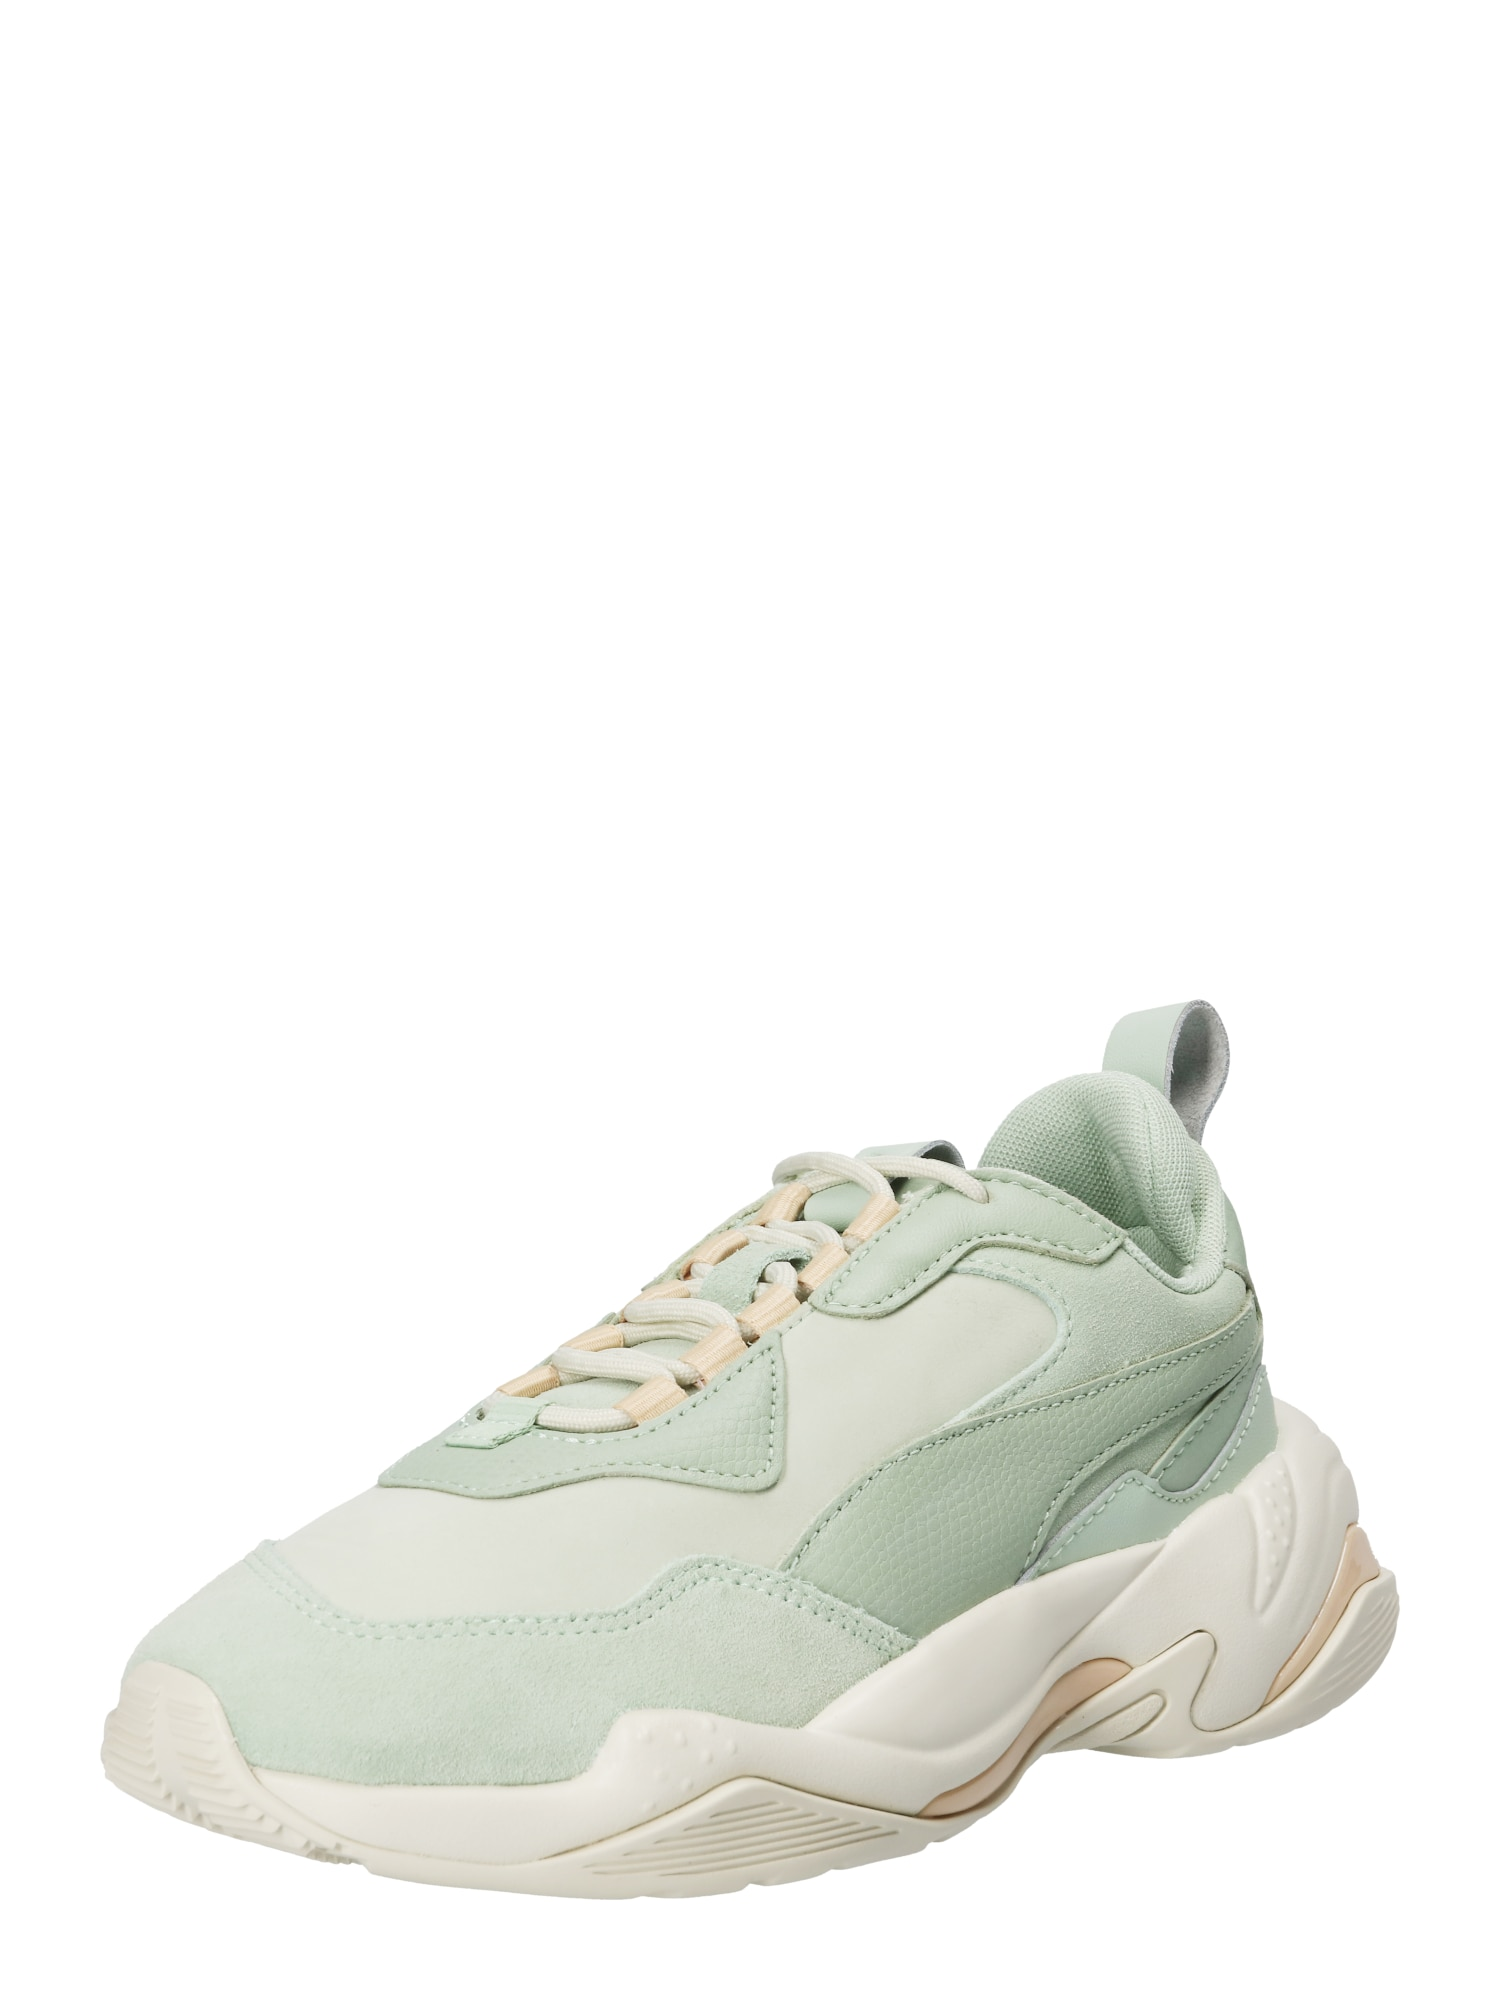 PUMA, Dames Sneakers laag 'Thunder Desert', jade groen / wit